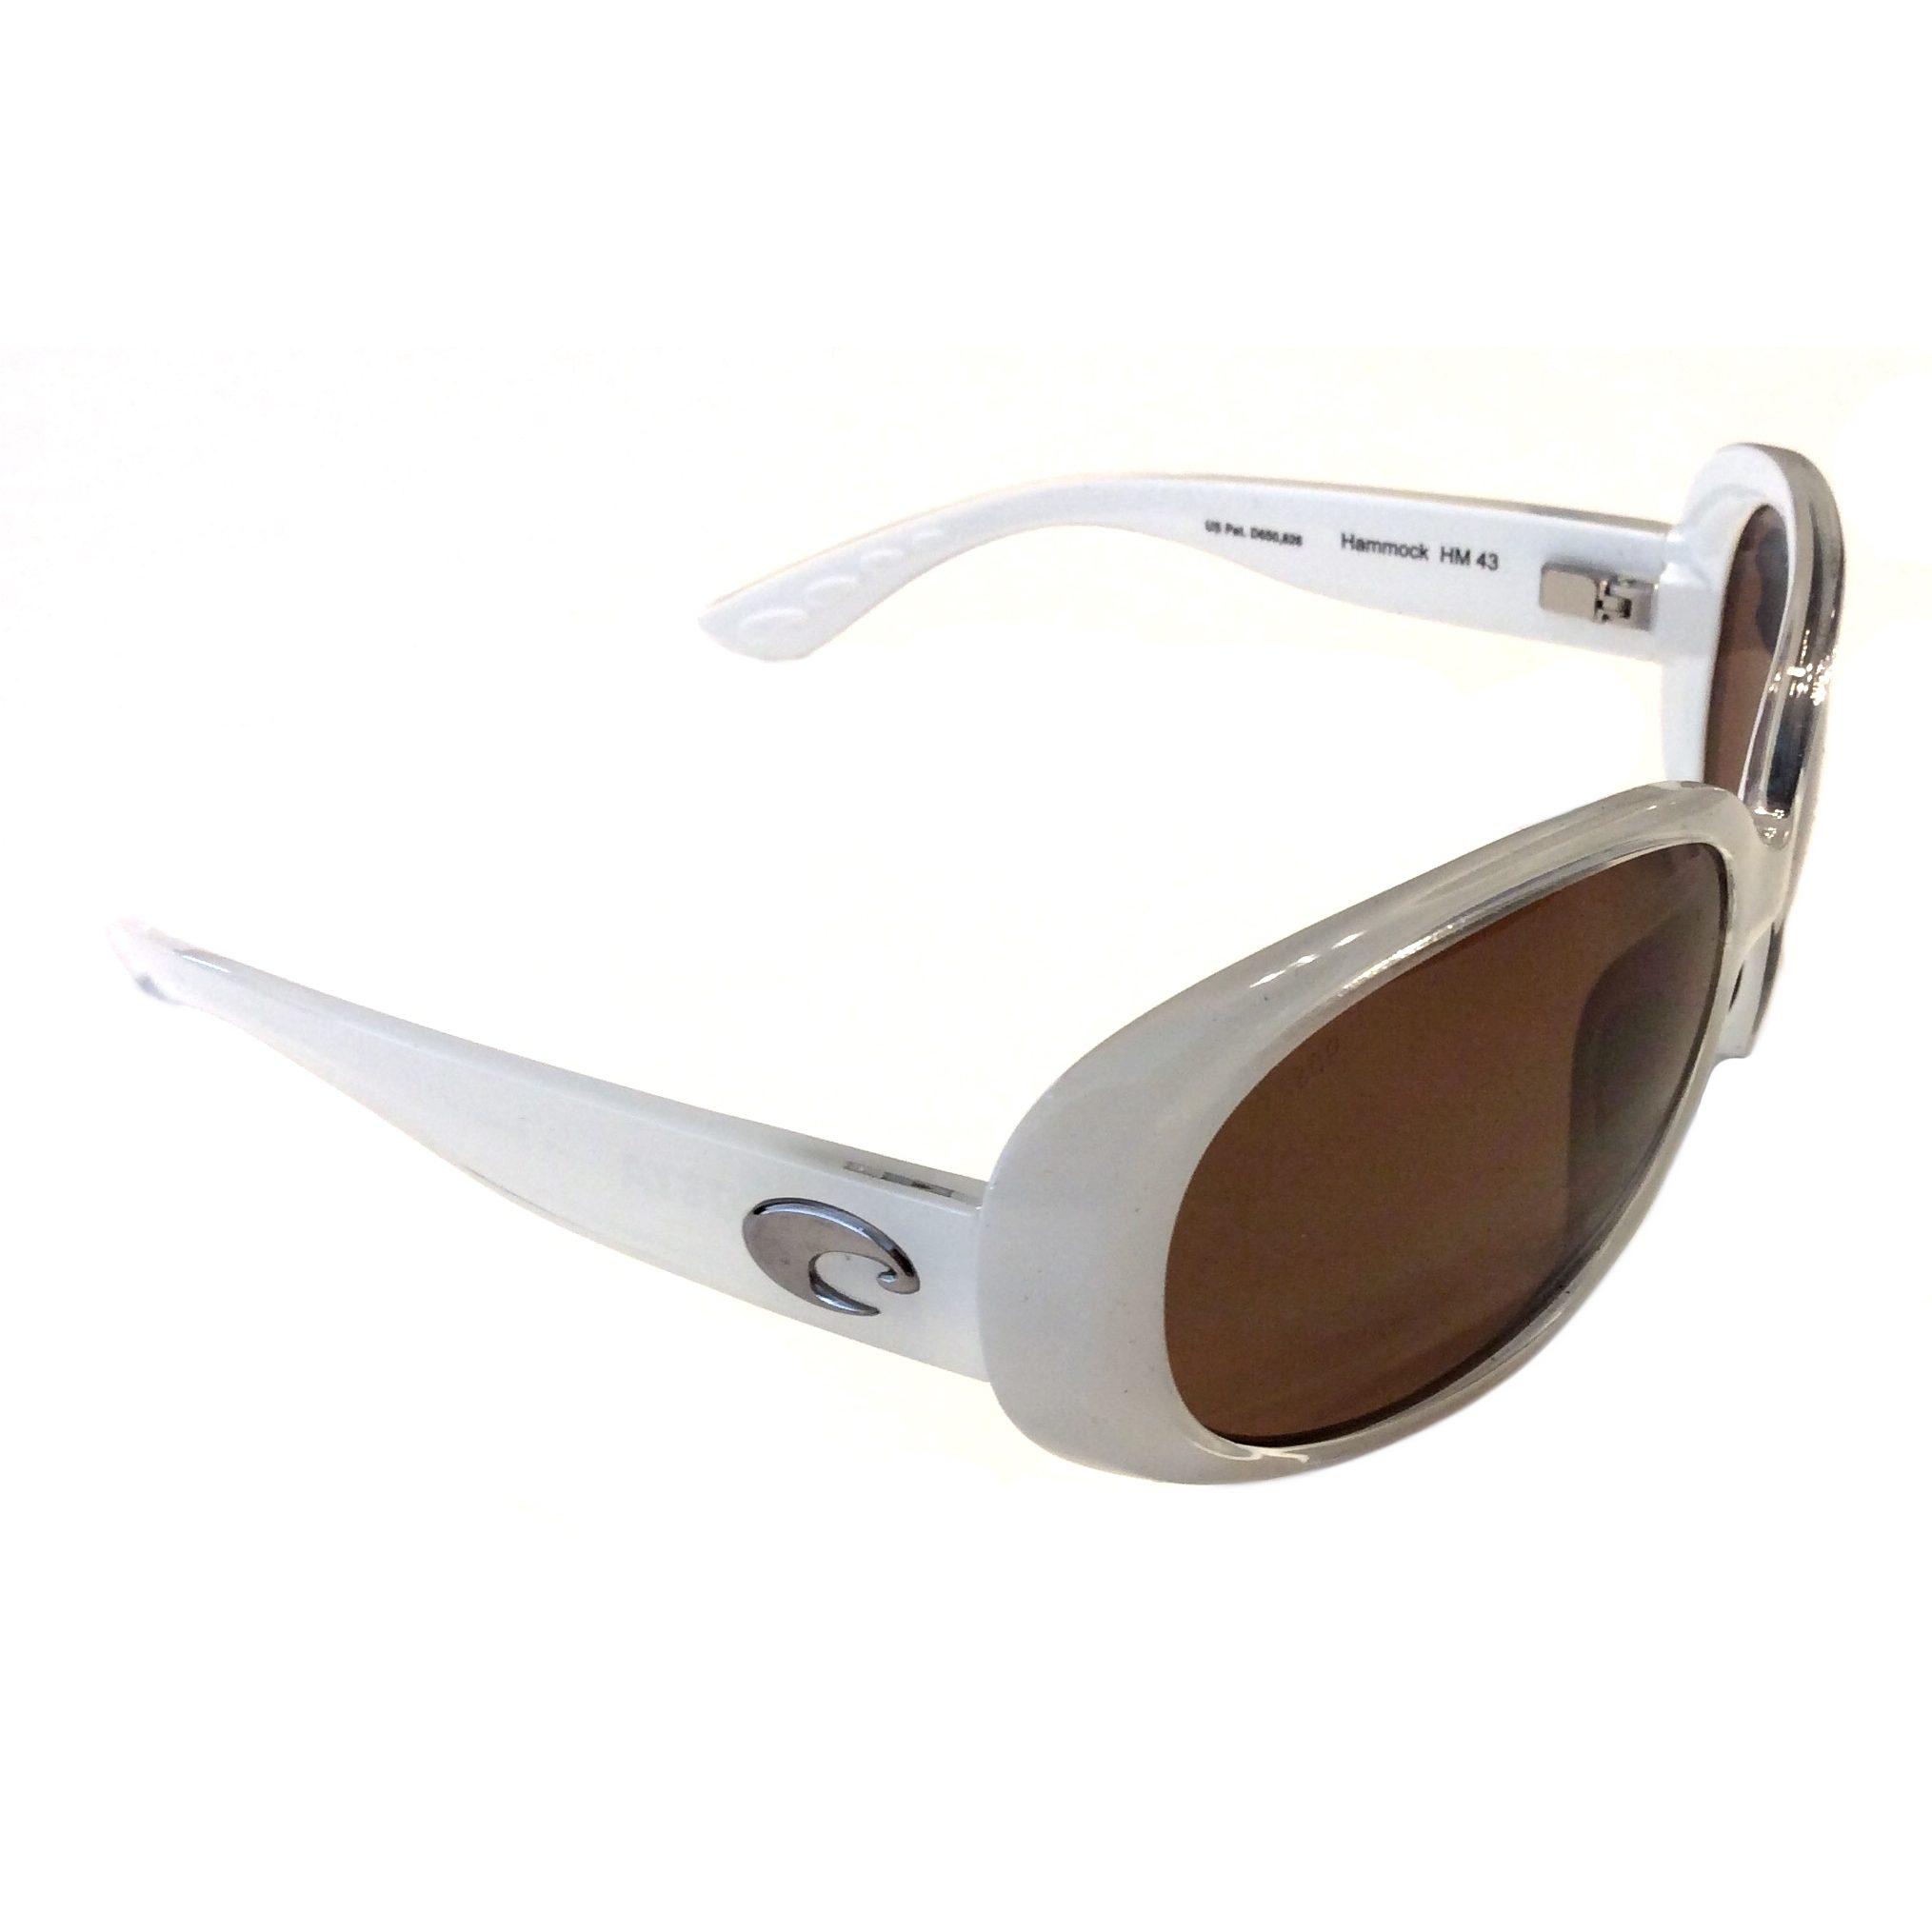 costa del mar hammock sunglasses   sand white   polarized amber 580p costa del mar hammock  u2013 sand white  u2013 polarized amber 580p      rh   nativeslope